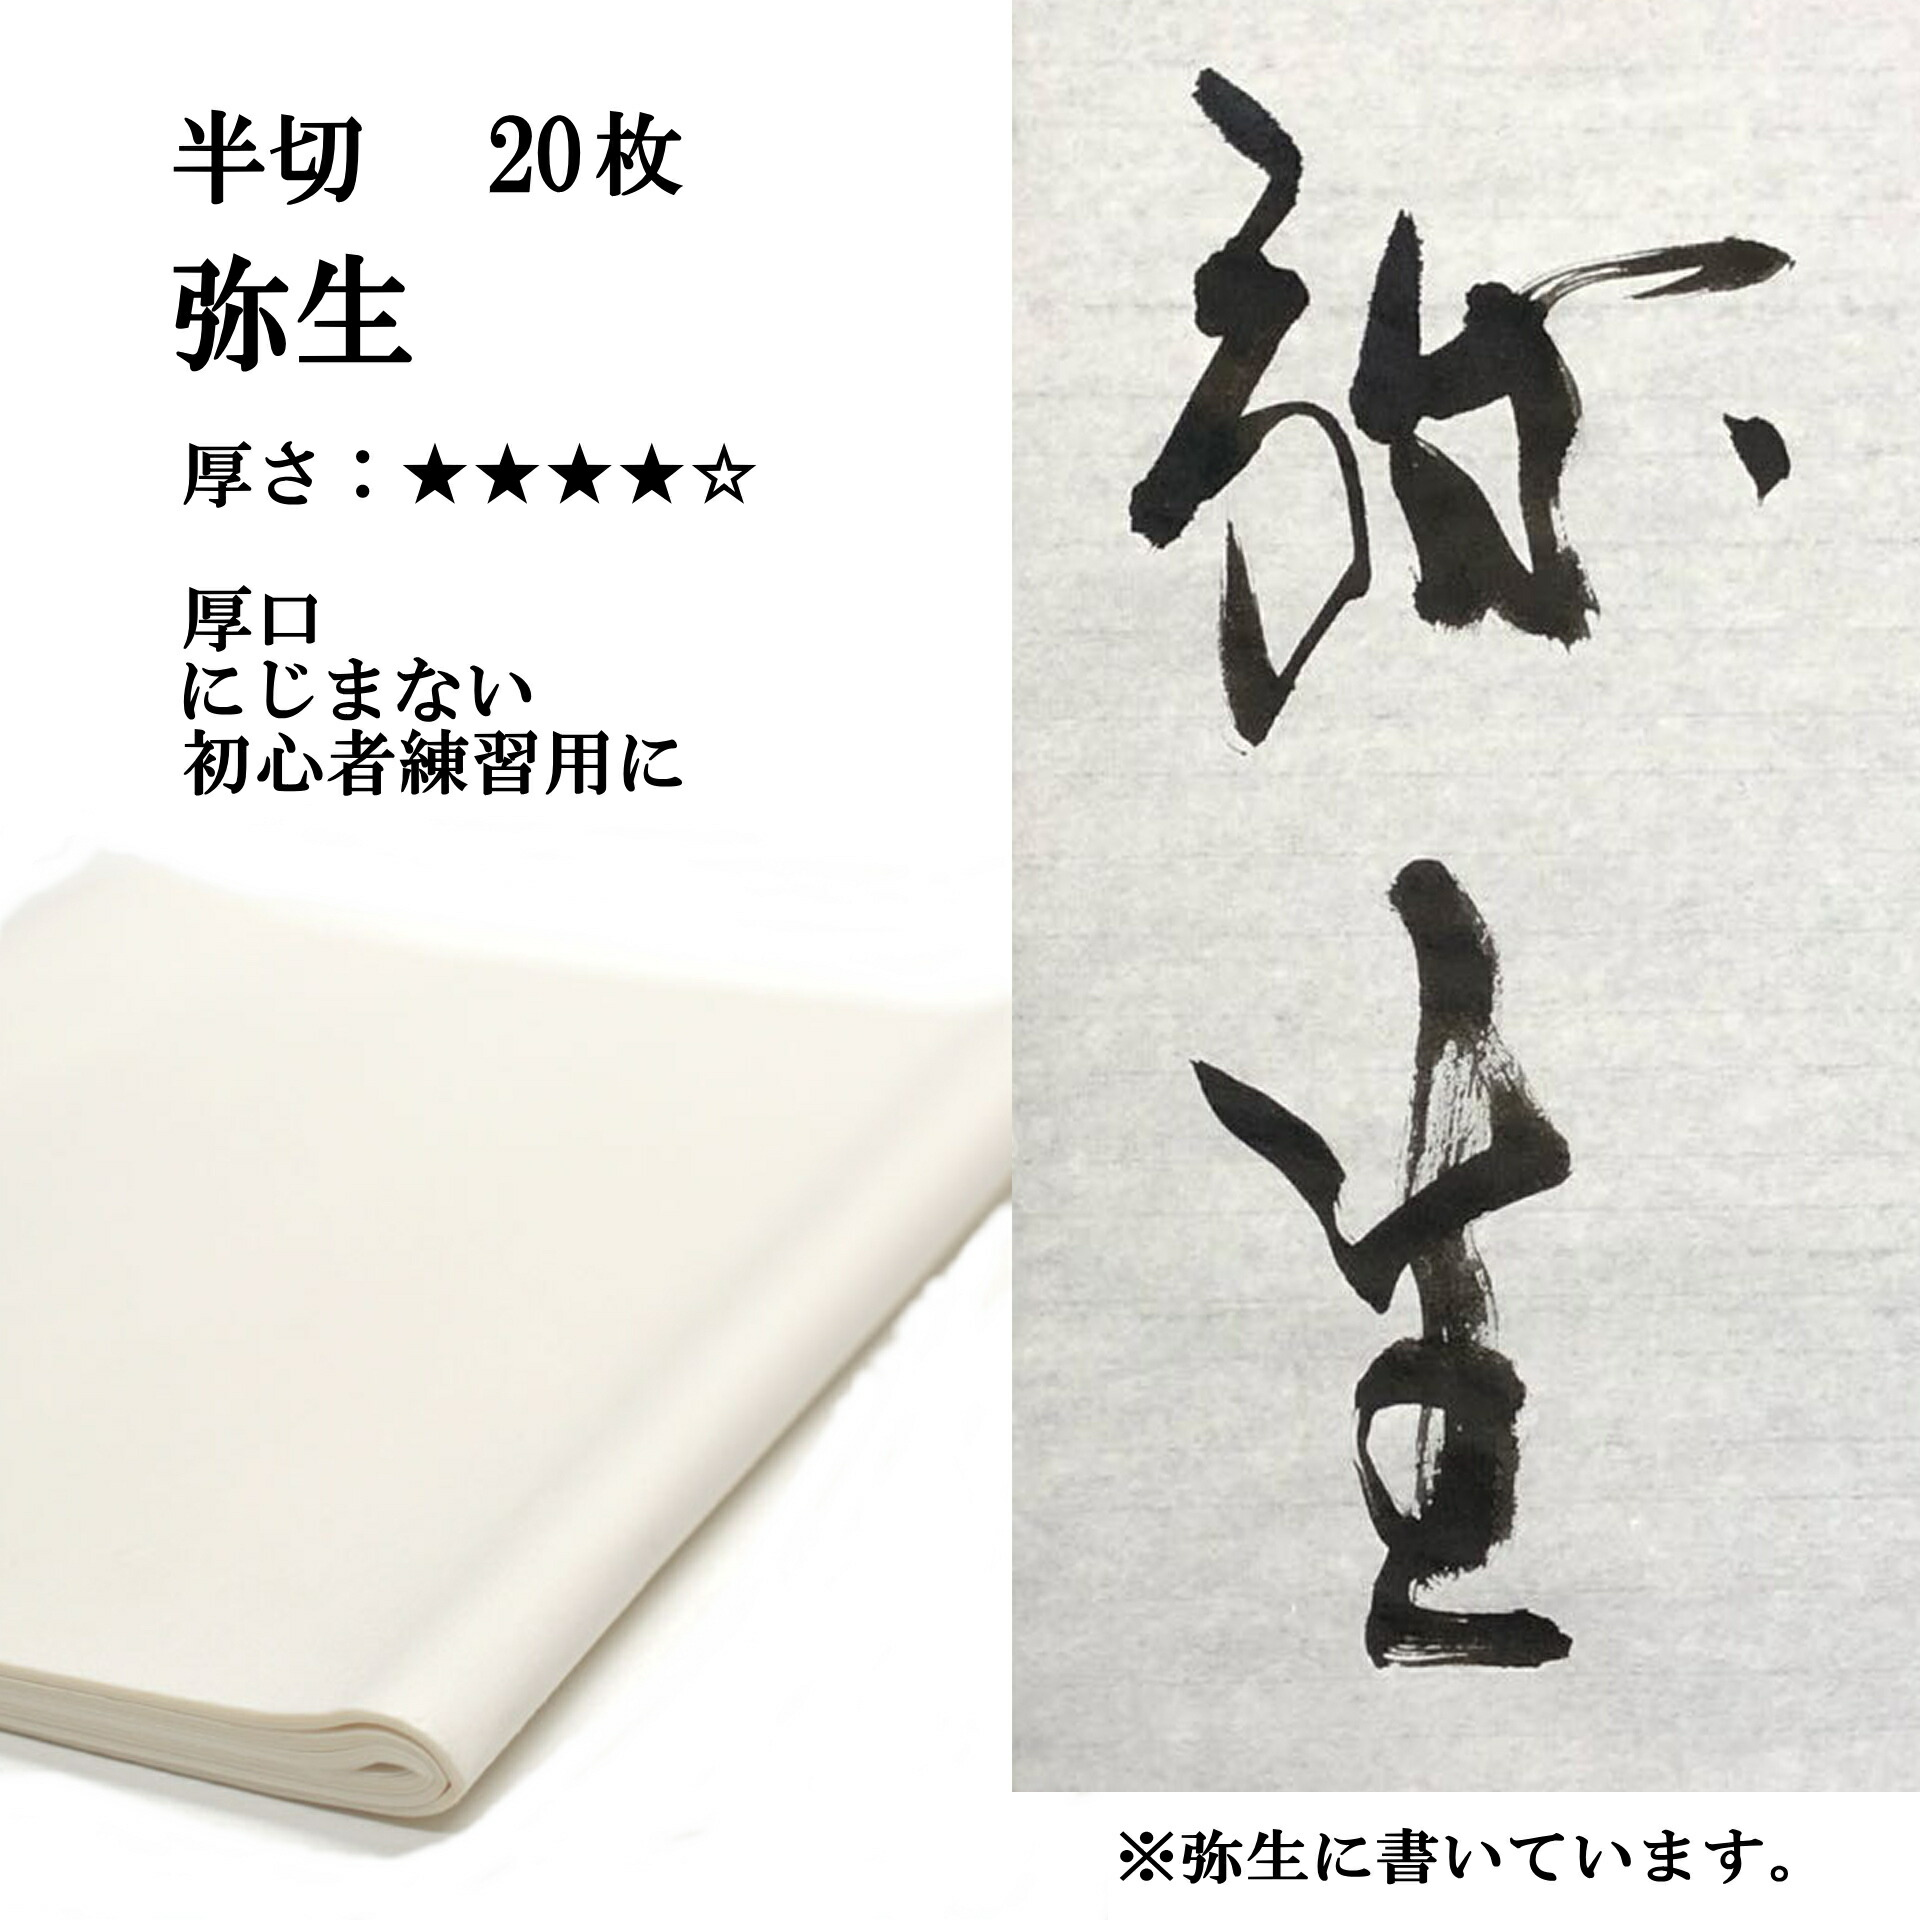 手漉き画仙紙 弥生 20枚